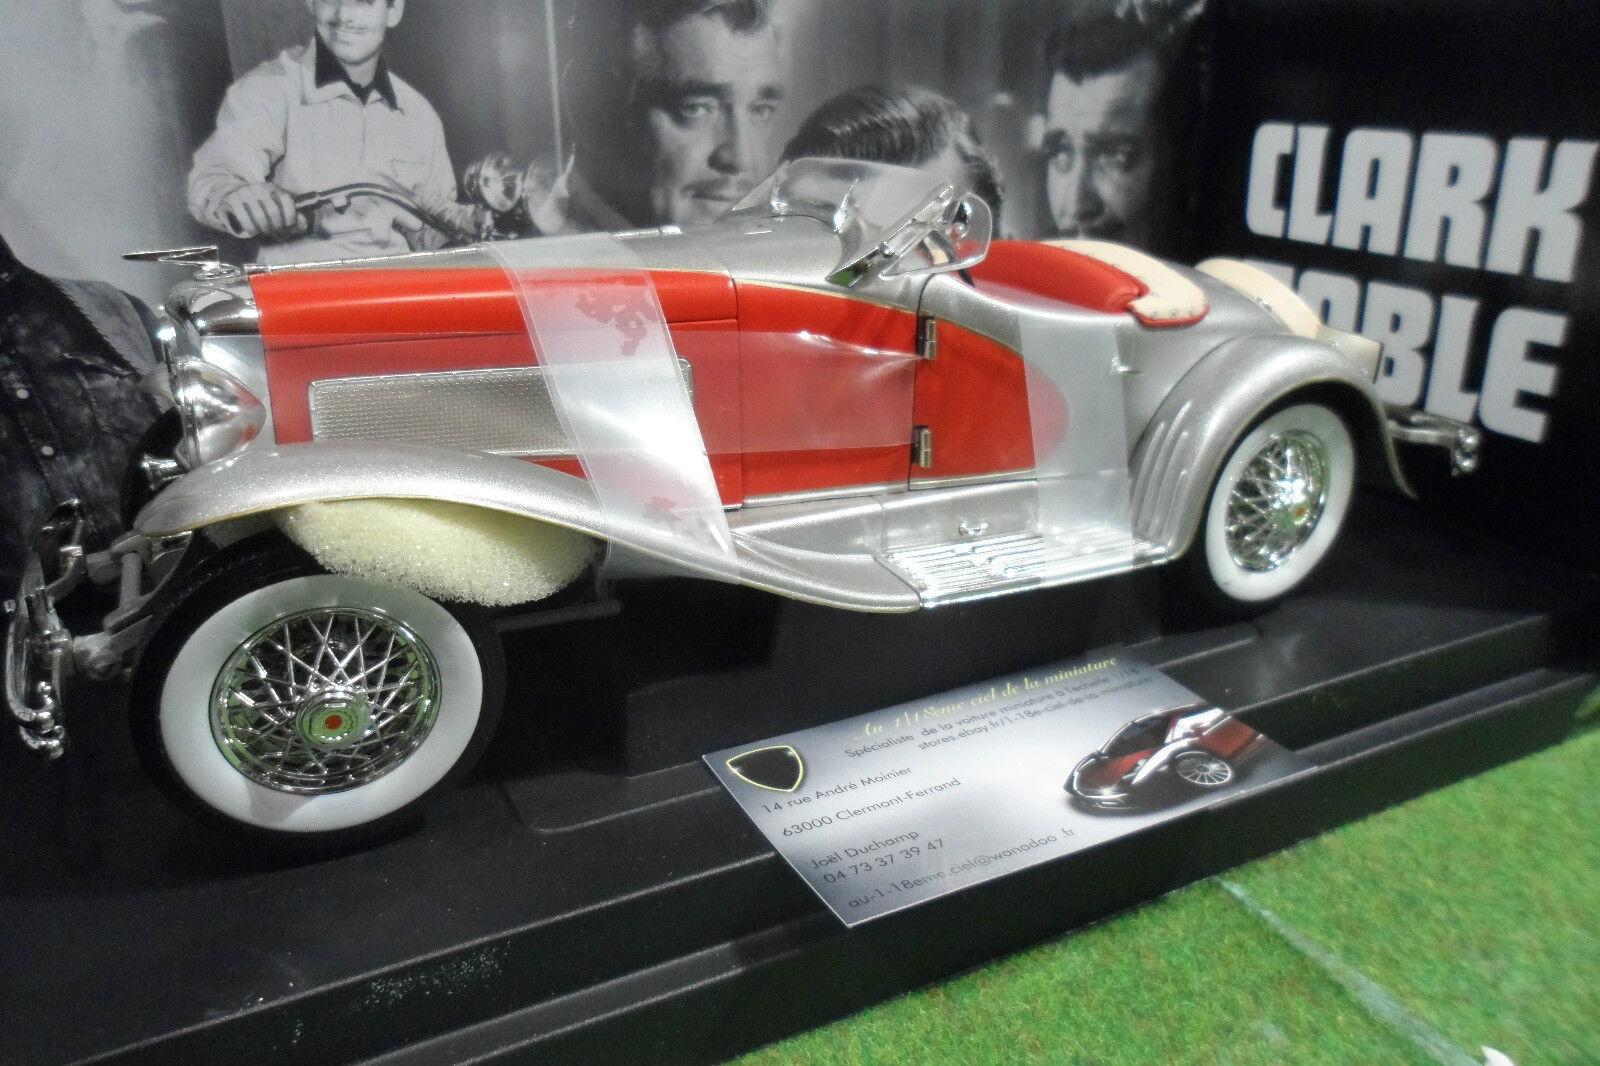 DUESENBERG SJ stradaster Cabriolet Clark GABLE au 1 18 18 18 d AMERICAN MUSCLE ERTL 7962 78d68c